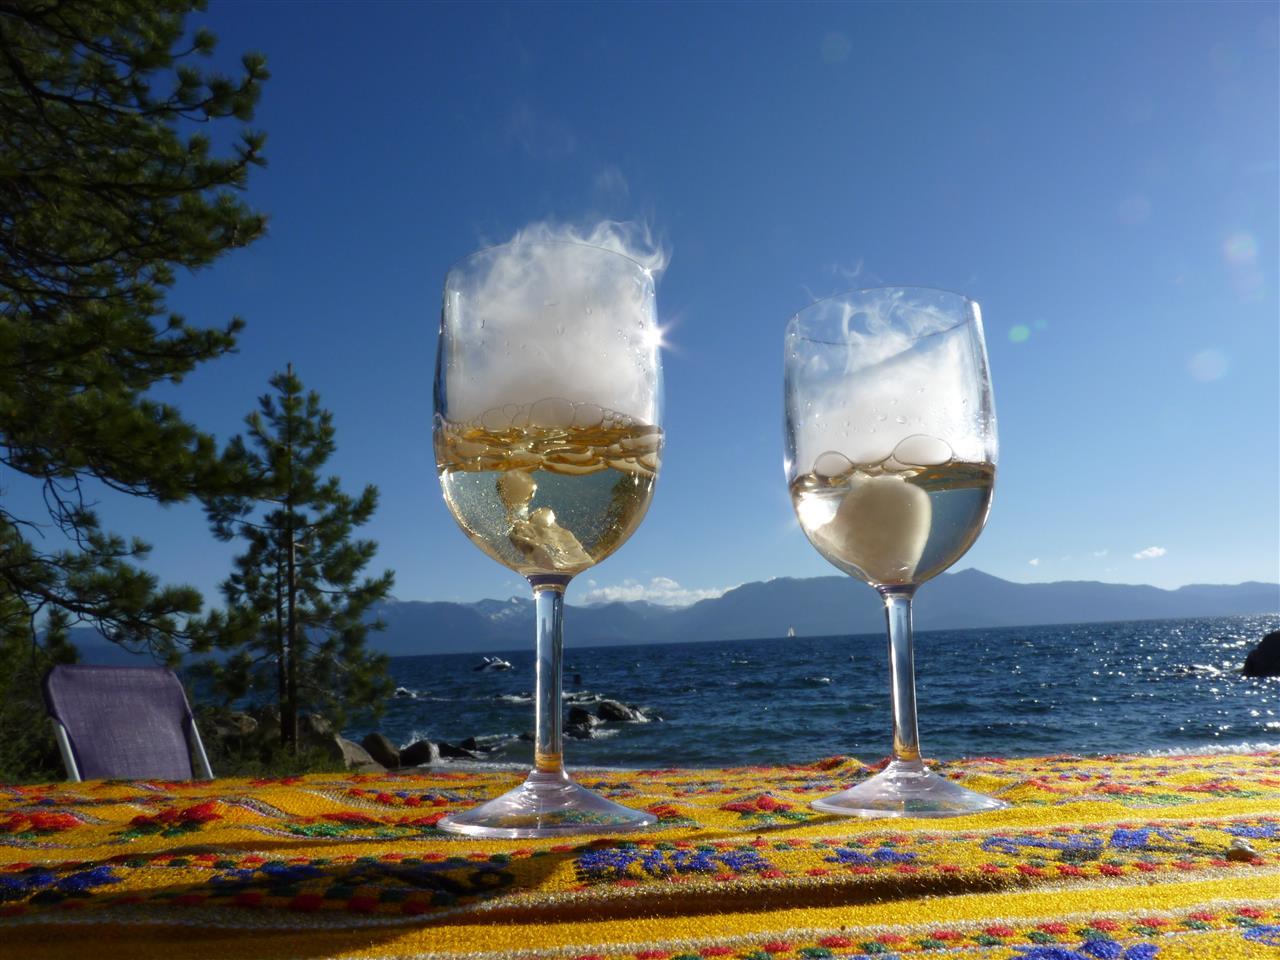 Summer Toast at Skyland Beach Zephyr Cove, Nevada Lake Tahoe